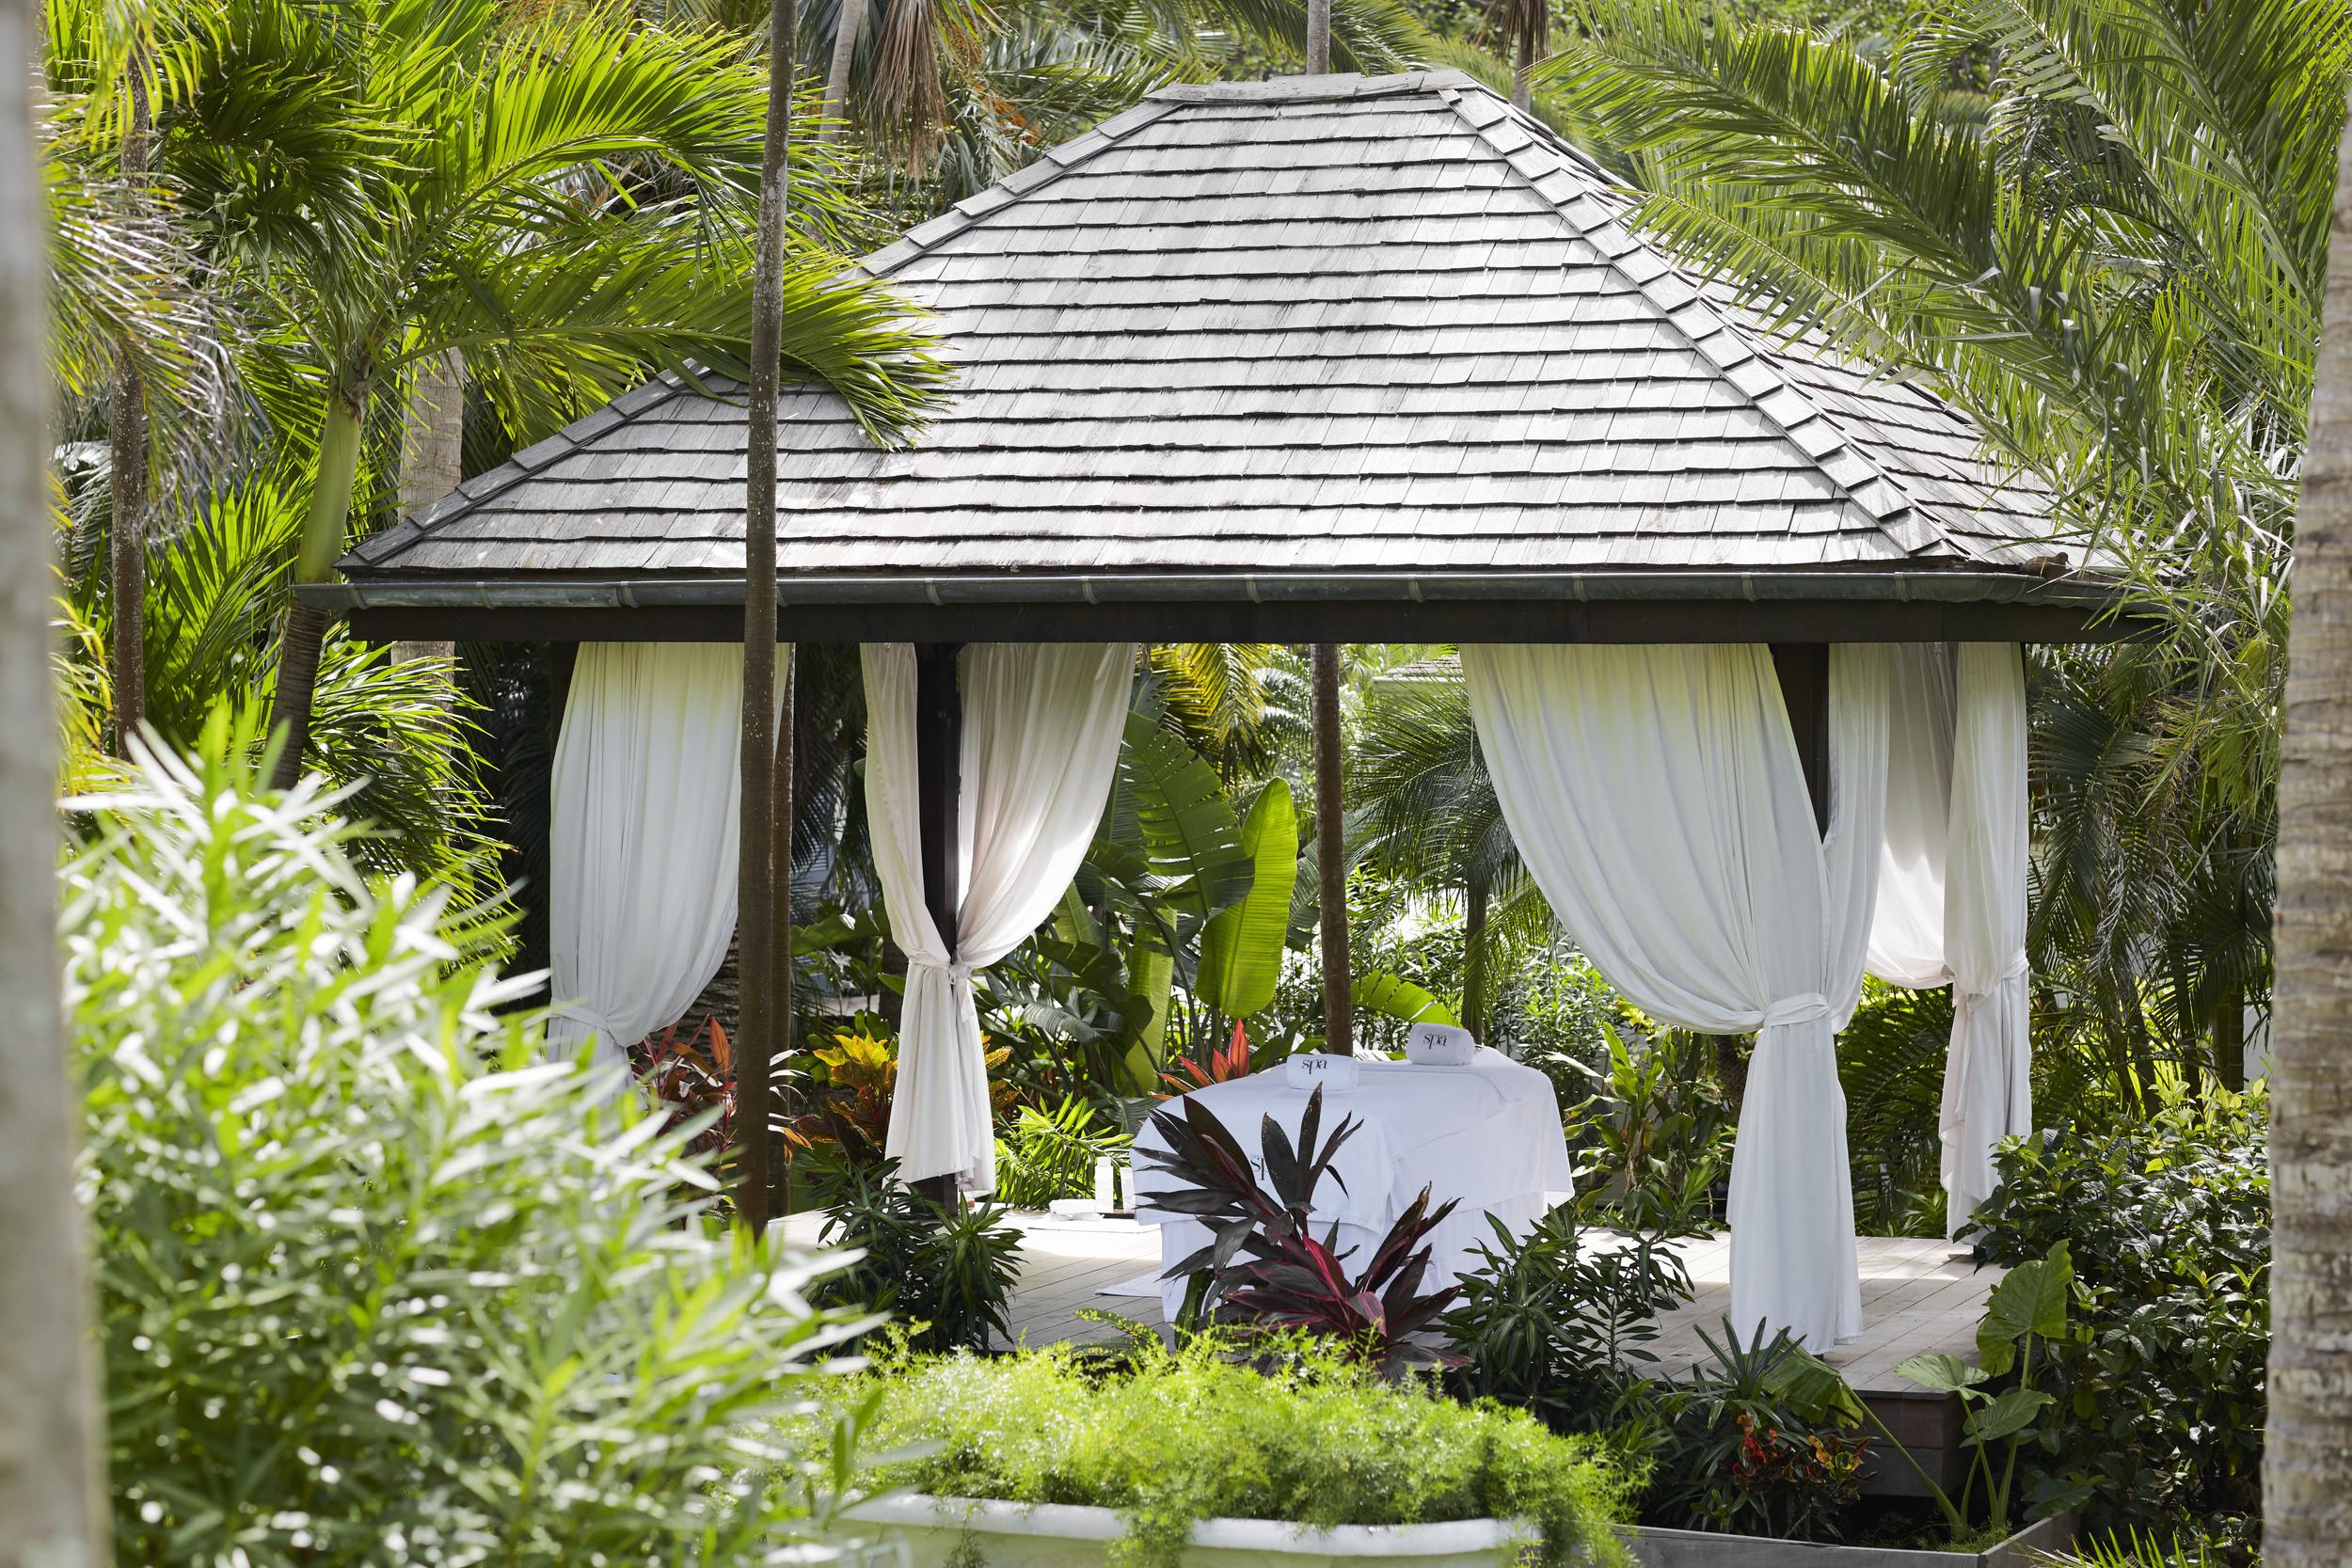 20141218045813_cheval-blanc-st-barth-isle-de-france-tropical-pavilion[1].jpg